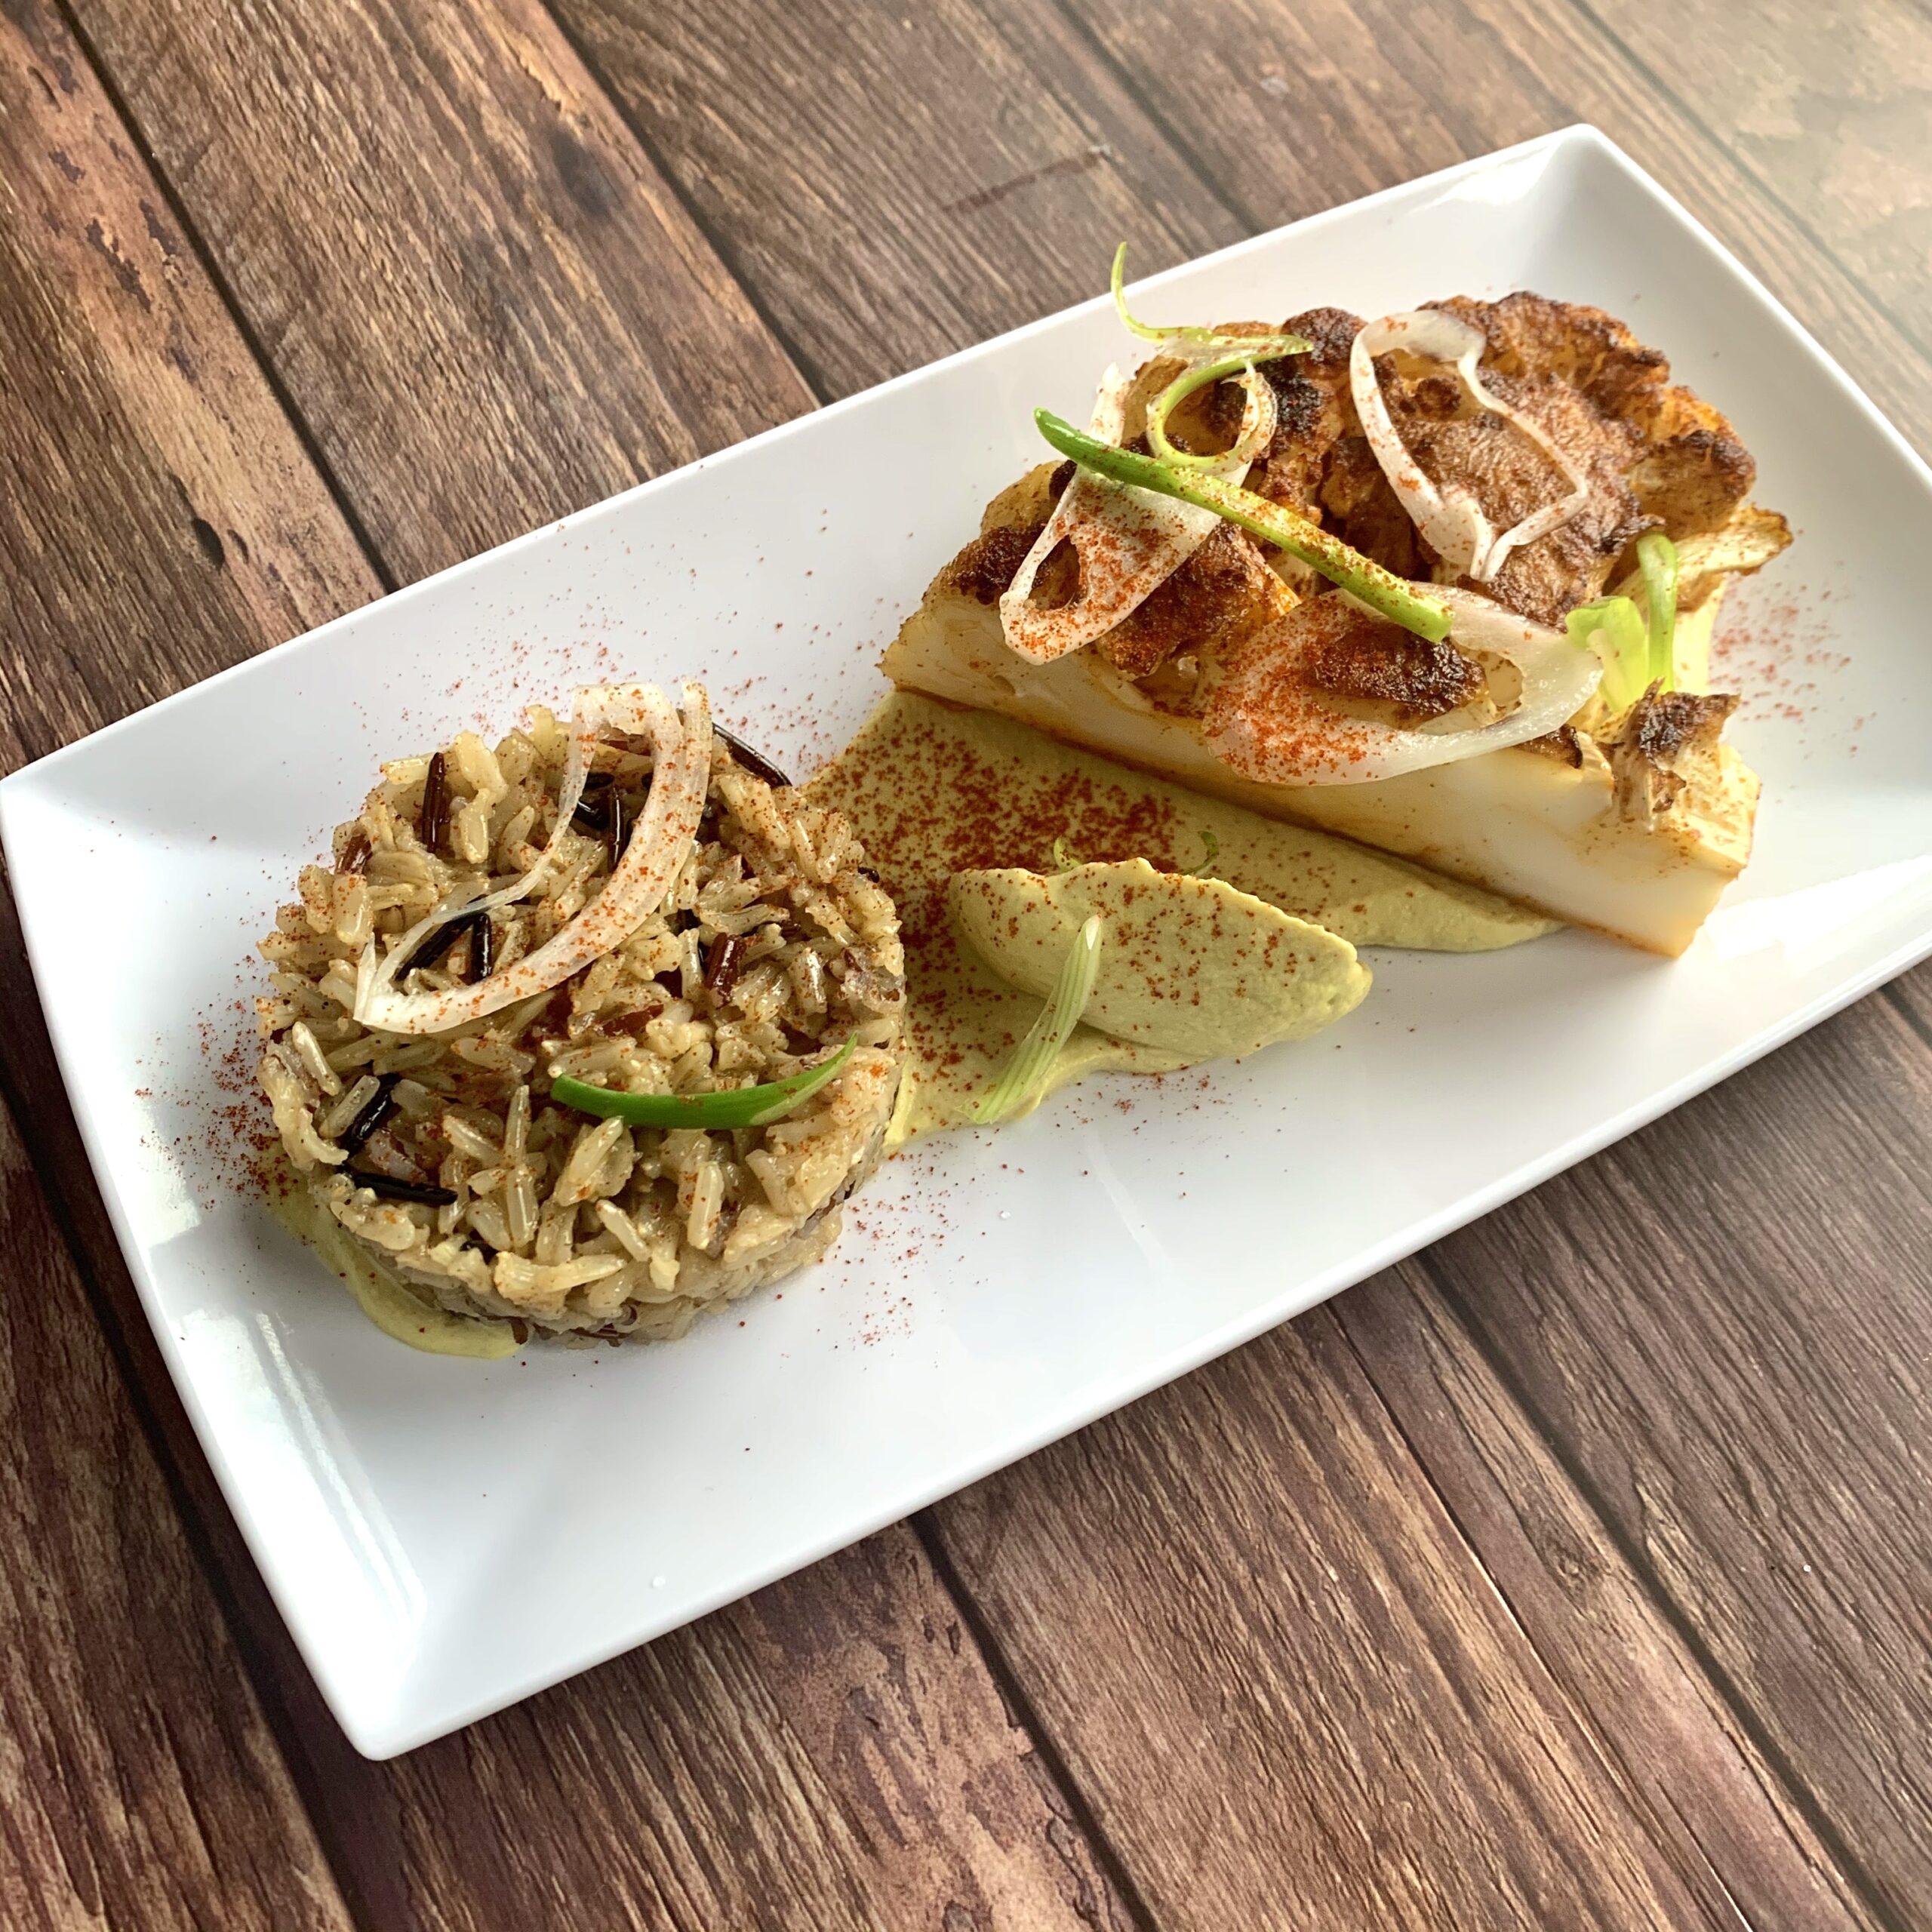 Personal Chef Collaboration: Spice House Cauliflower Steak